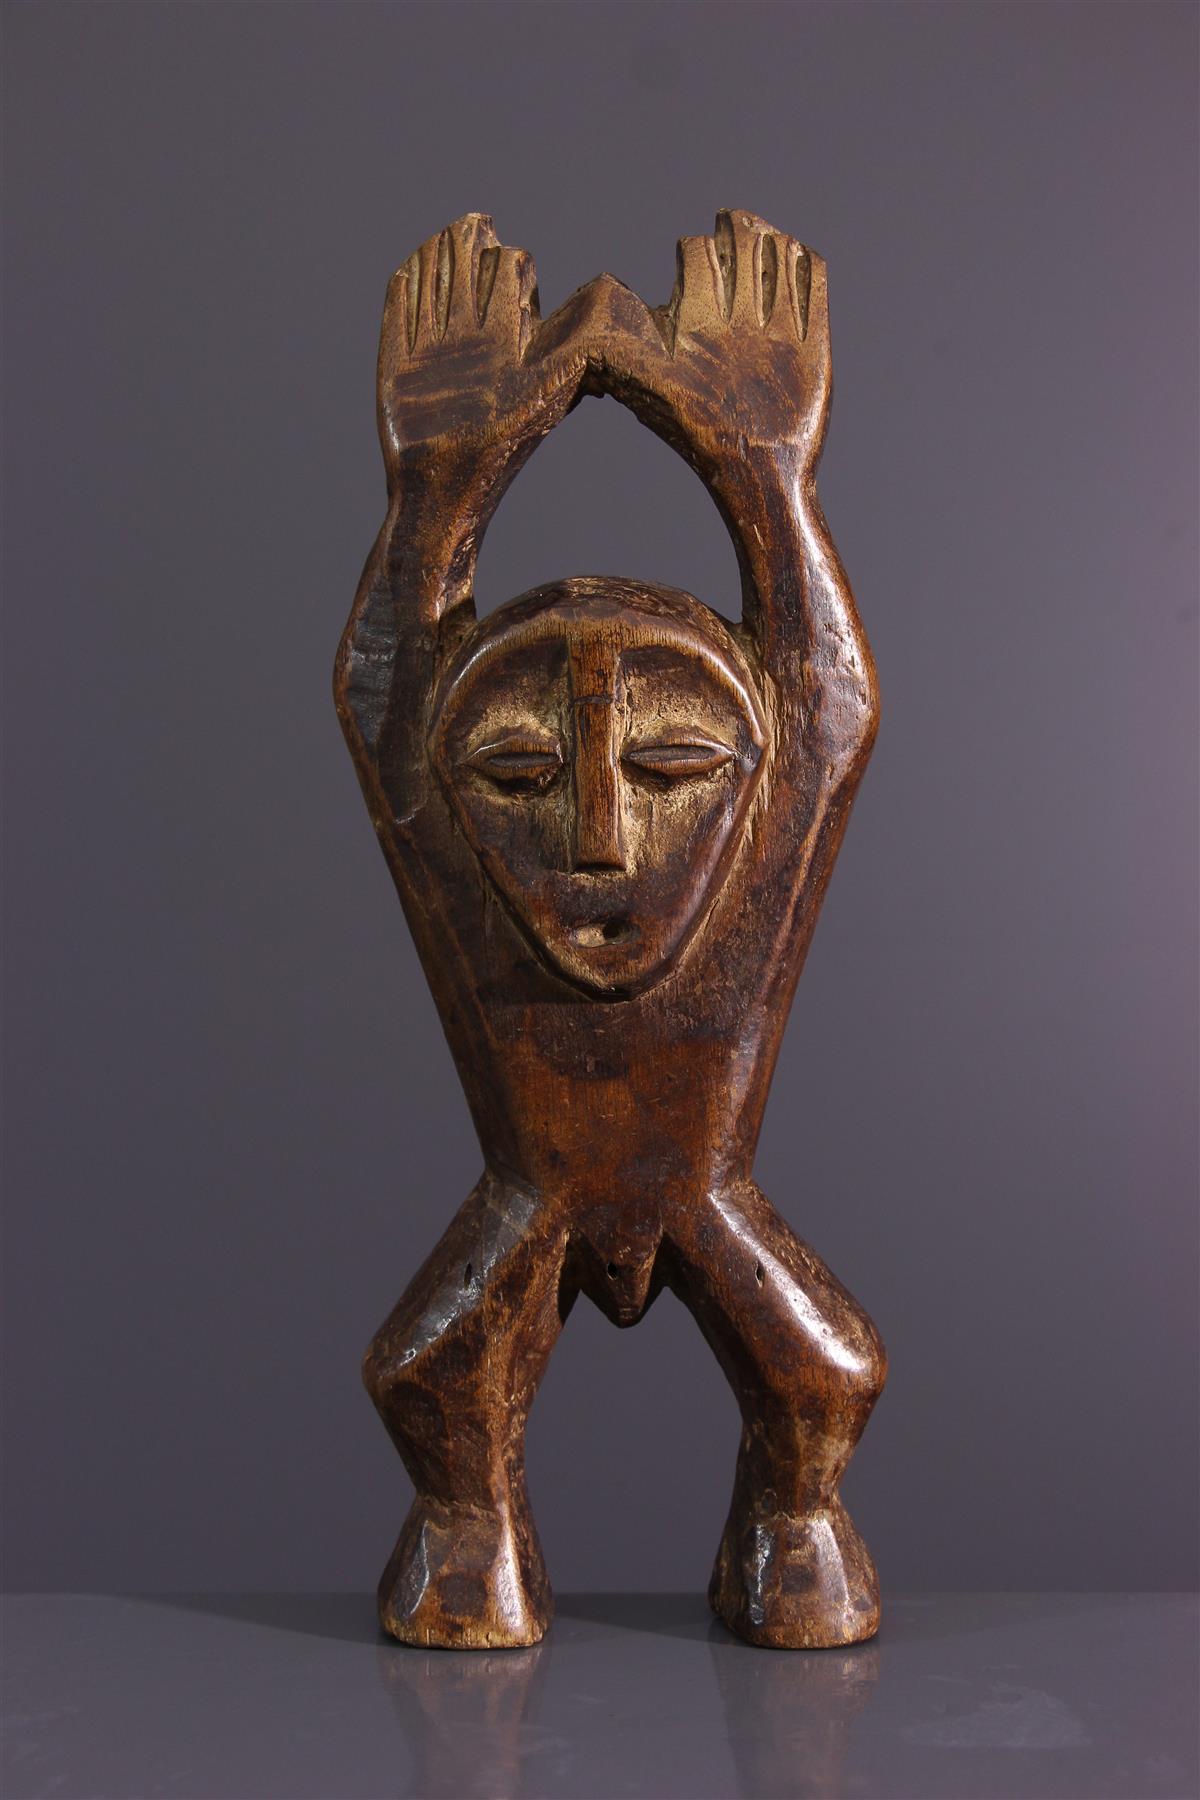 League Figurines - African art